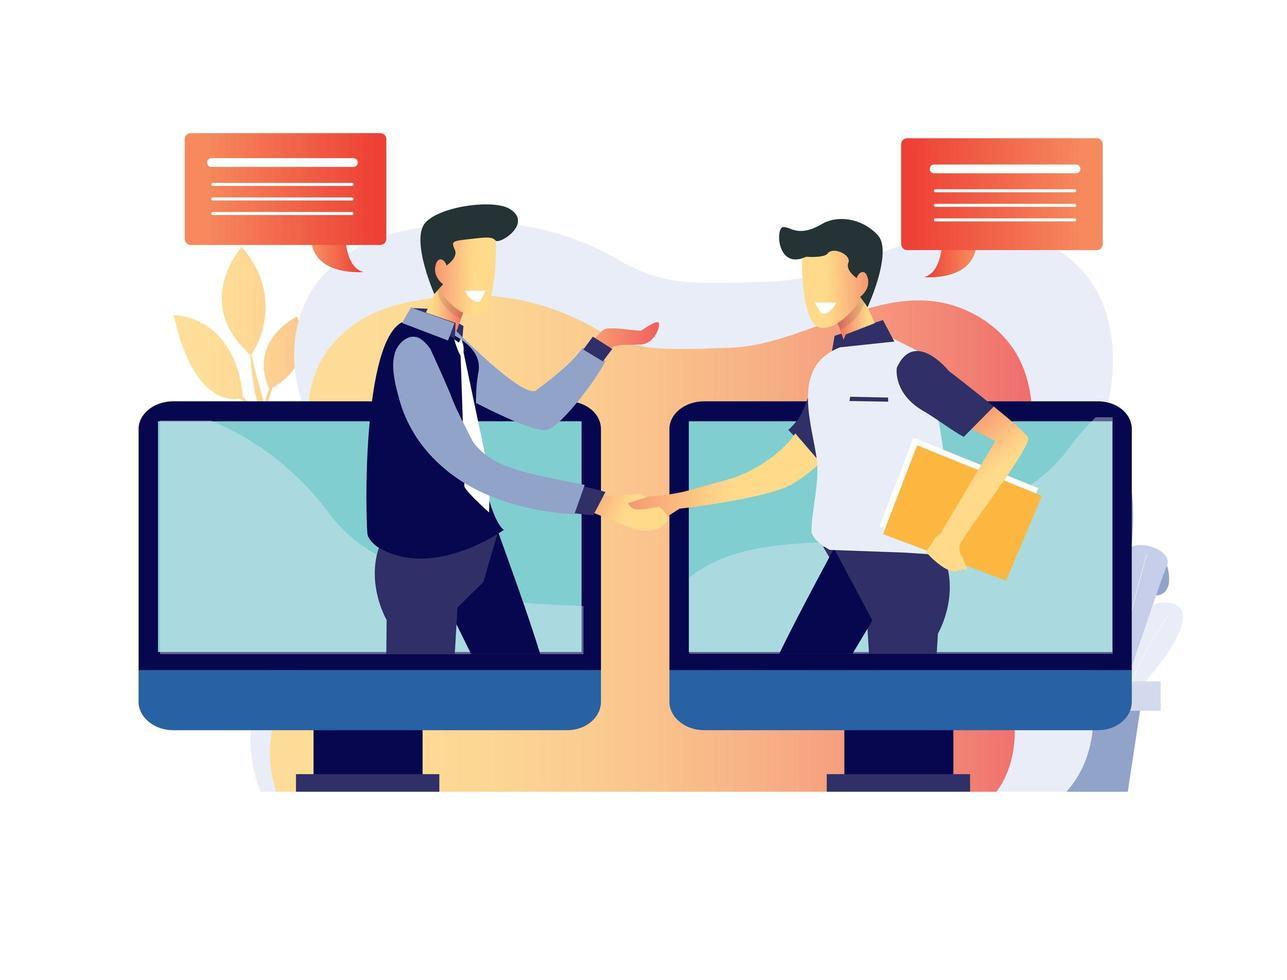 online-job-interviewing-process-vector